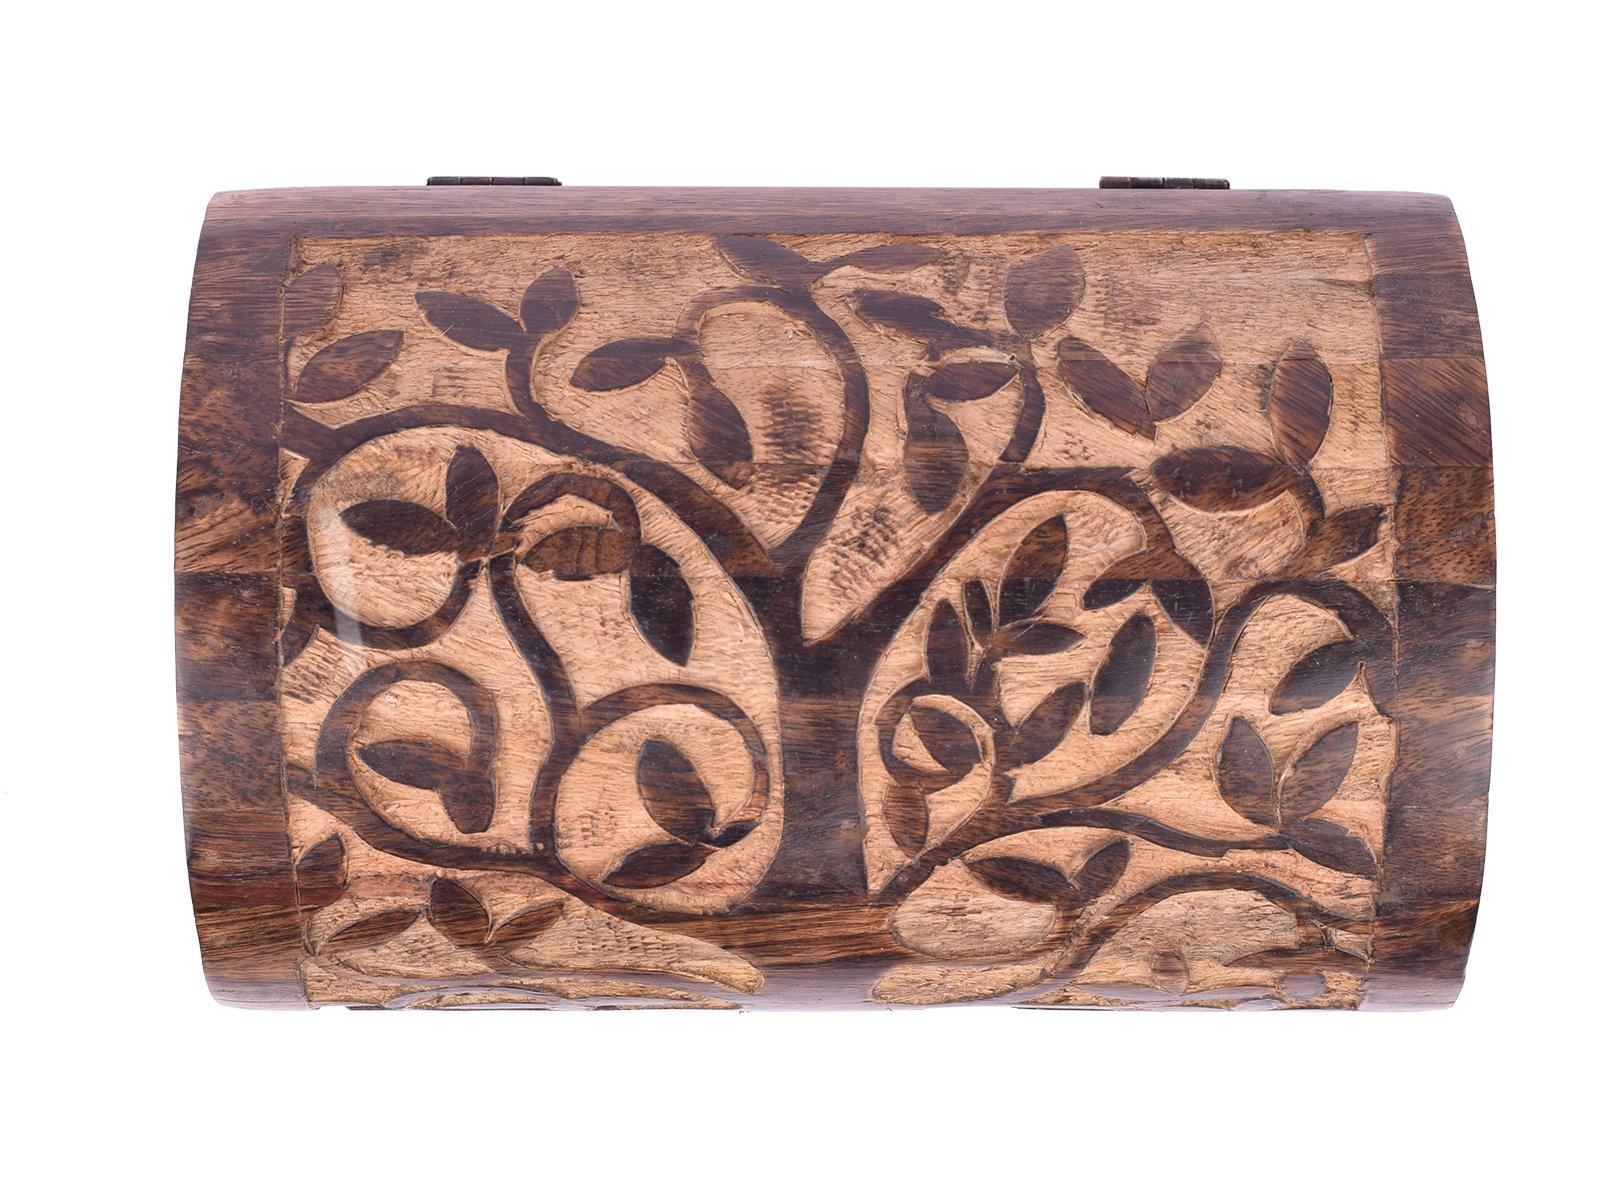 Large Wooden ''Tree of Life'' Chest Box Decorative Jewelry Trinket Holder Keepsake Storage Box Organizer Multi-utility 9 x 6 inches by storeindya (Image #3)